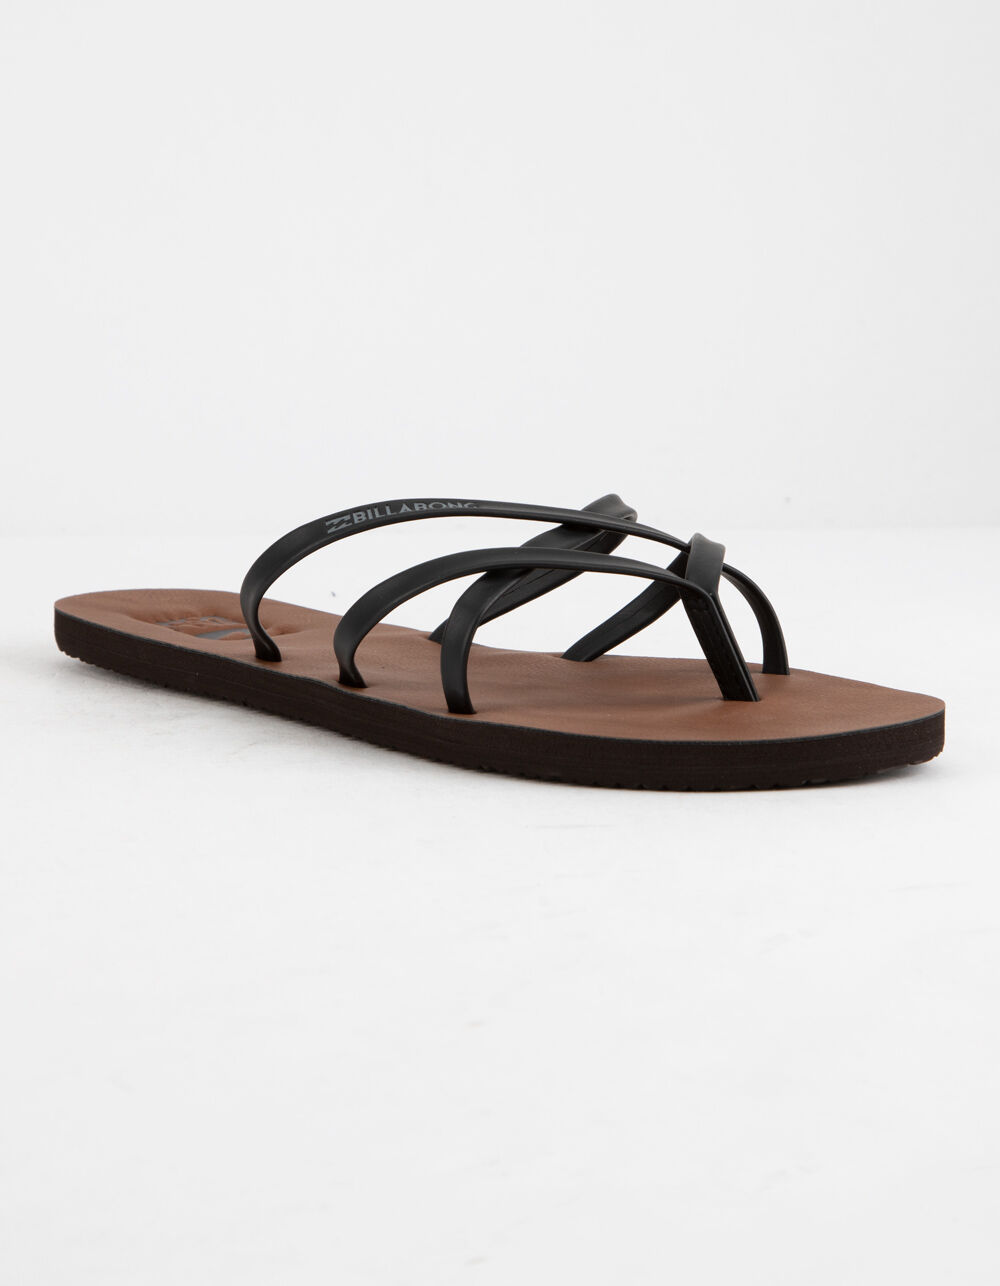 BILLABONG Paradise Cove Black Sandals